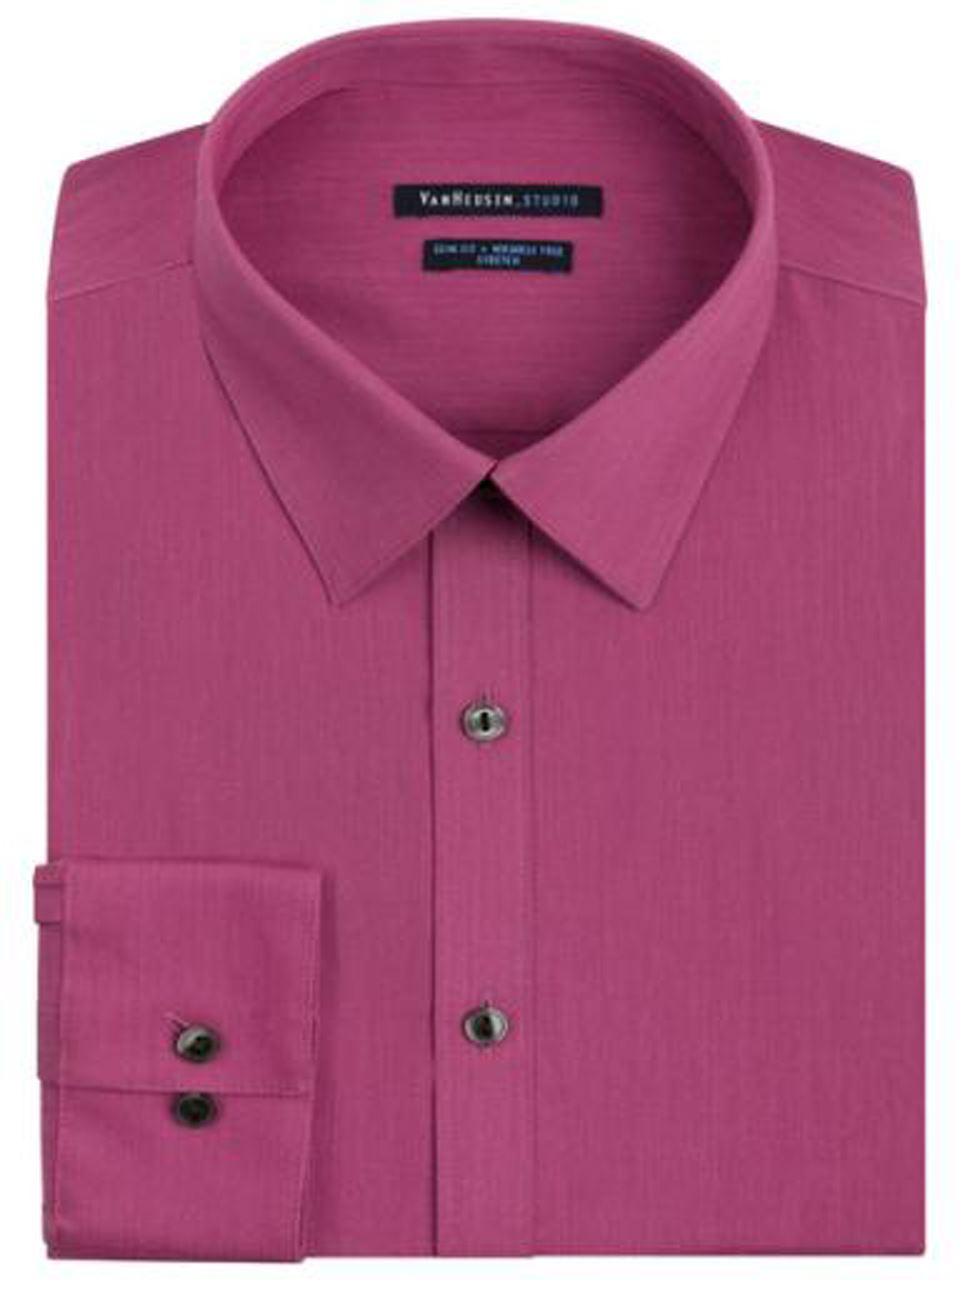 Mens shirt van heusen slim fit cotton rich easycare solid for Van heusen dress shirts